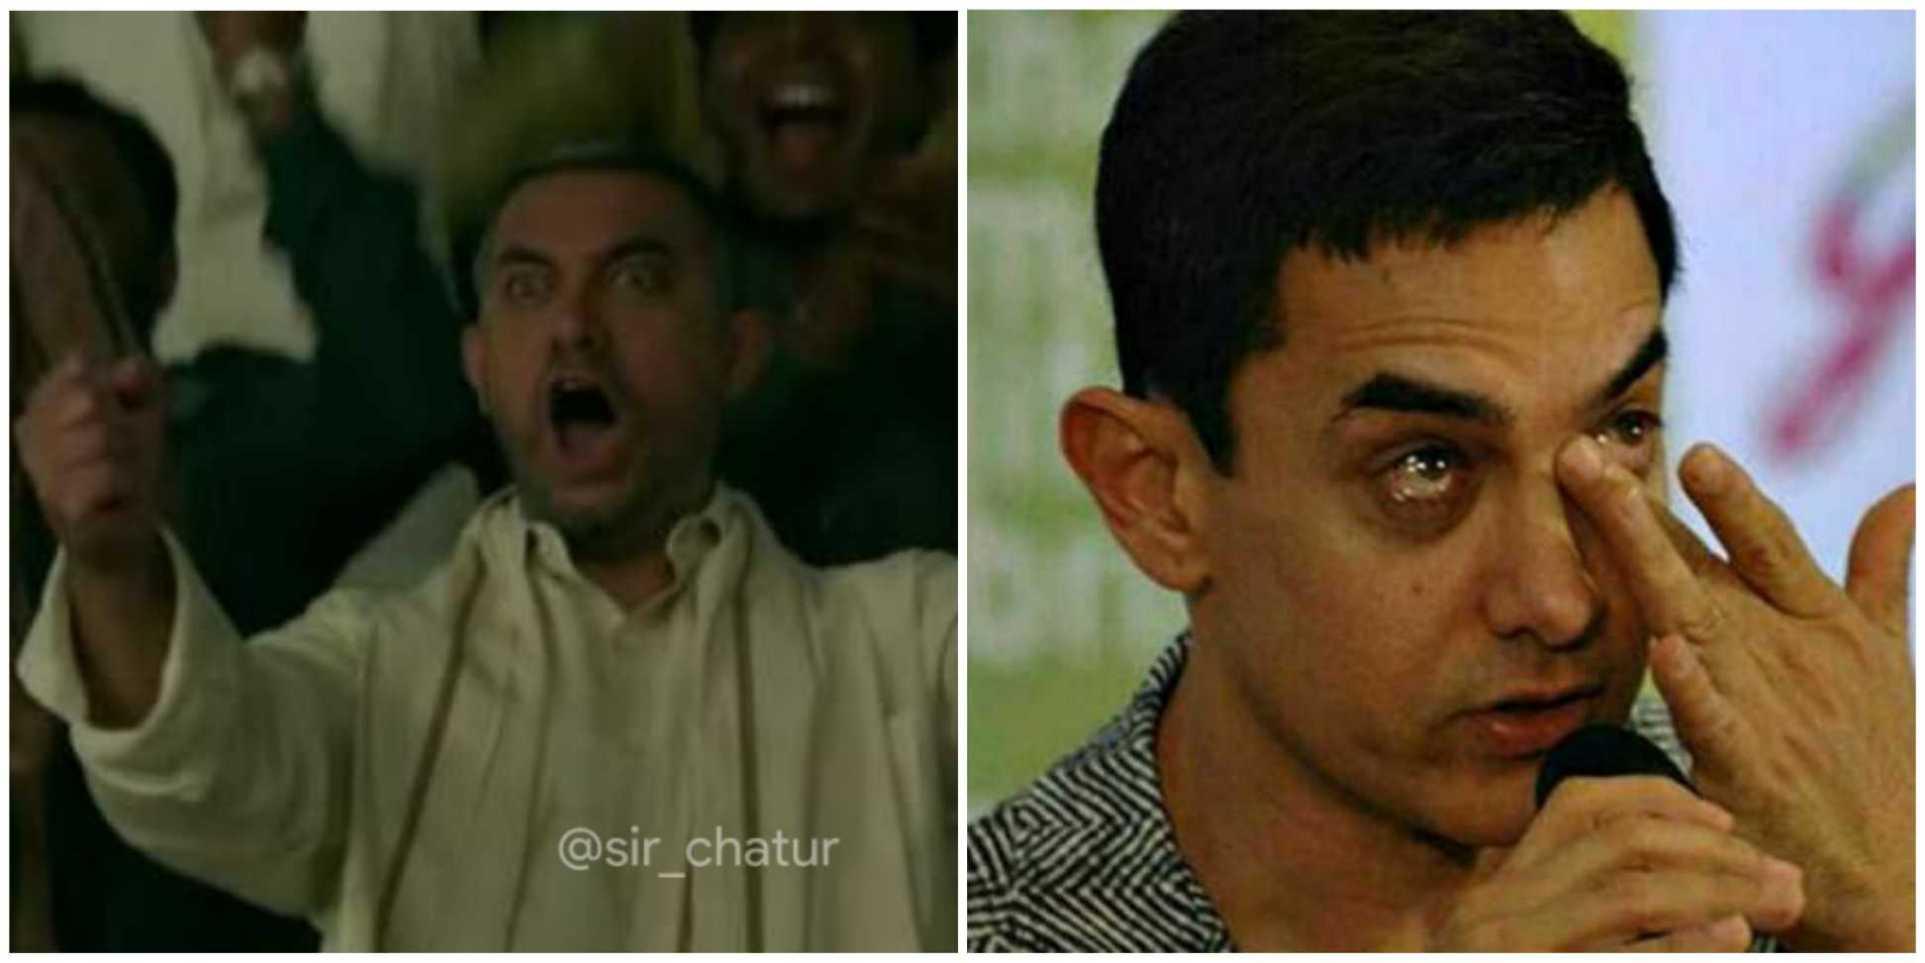 Aamir khan screaming vs crying meme template